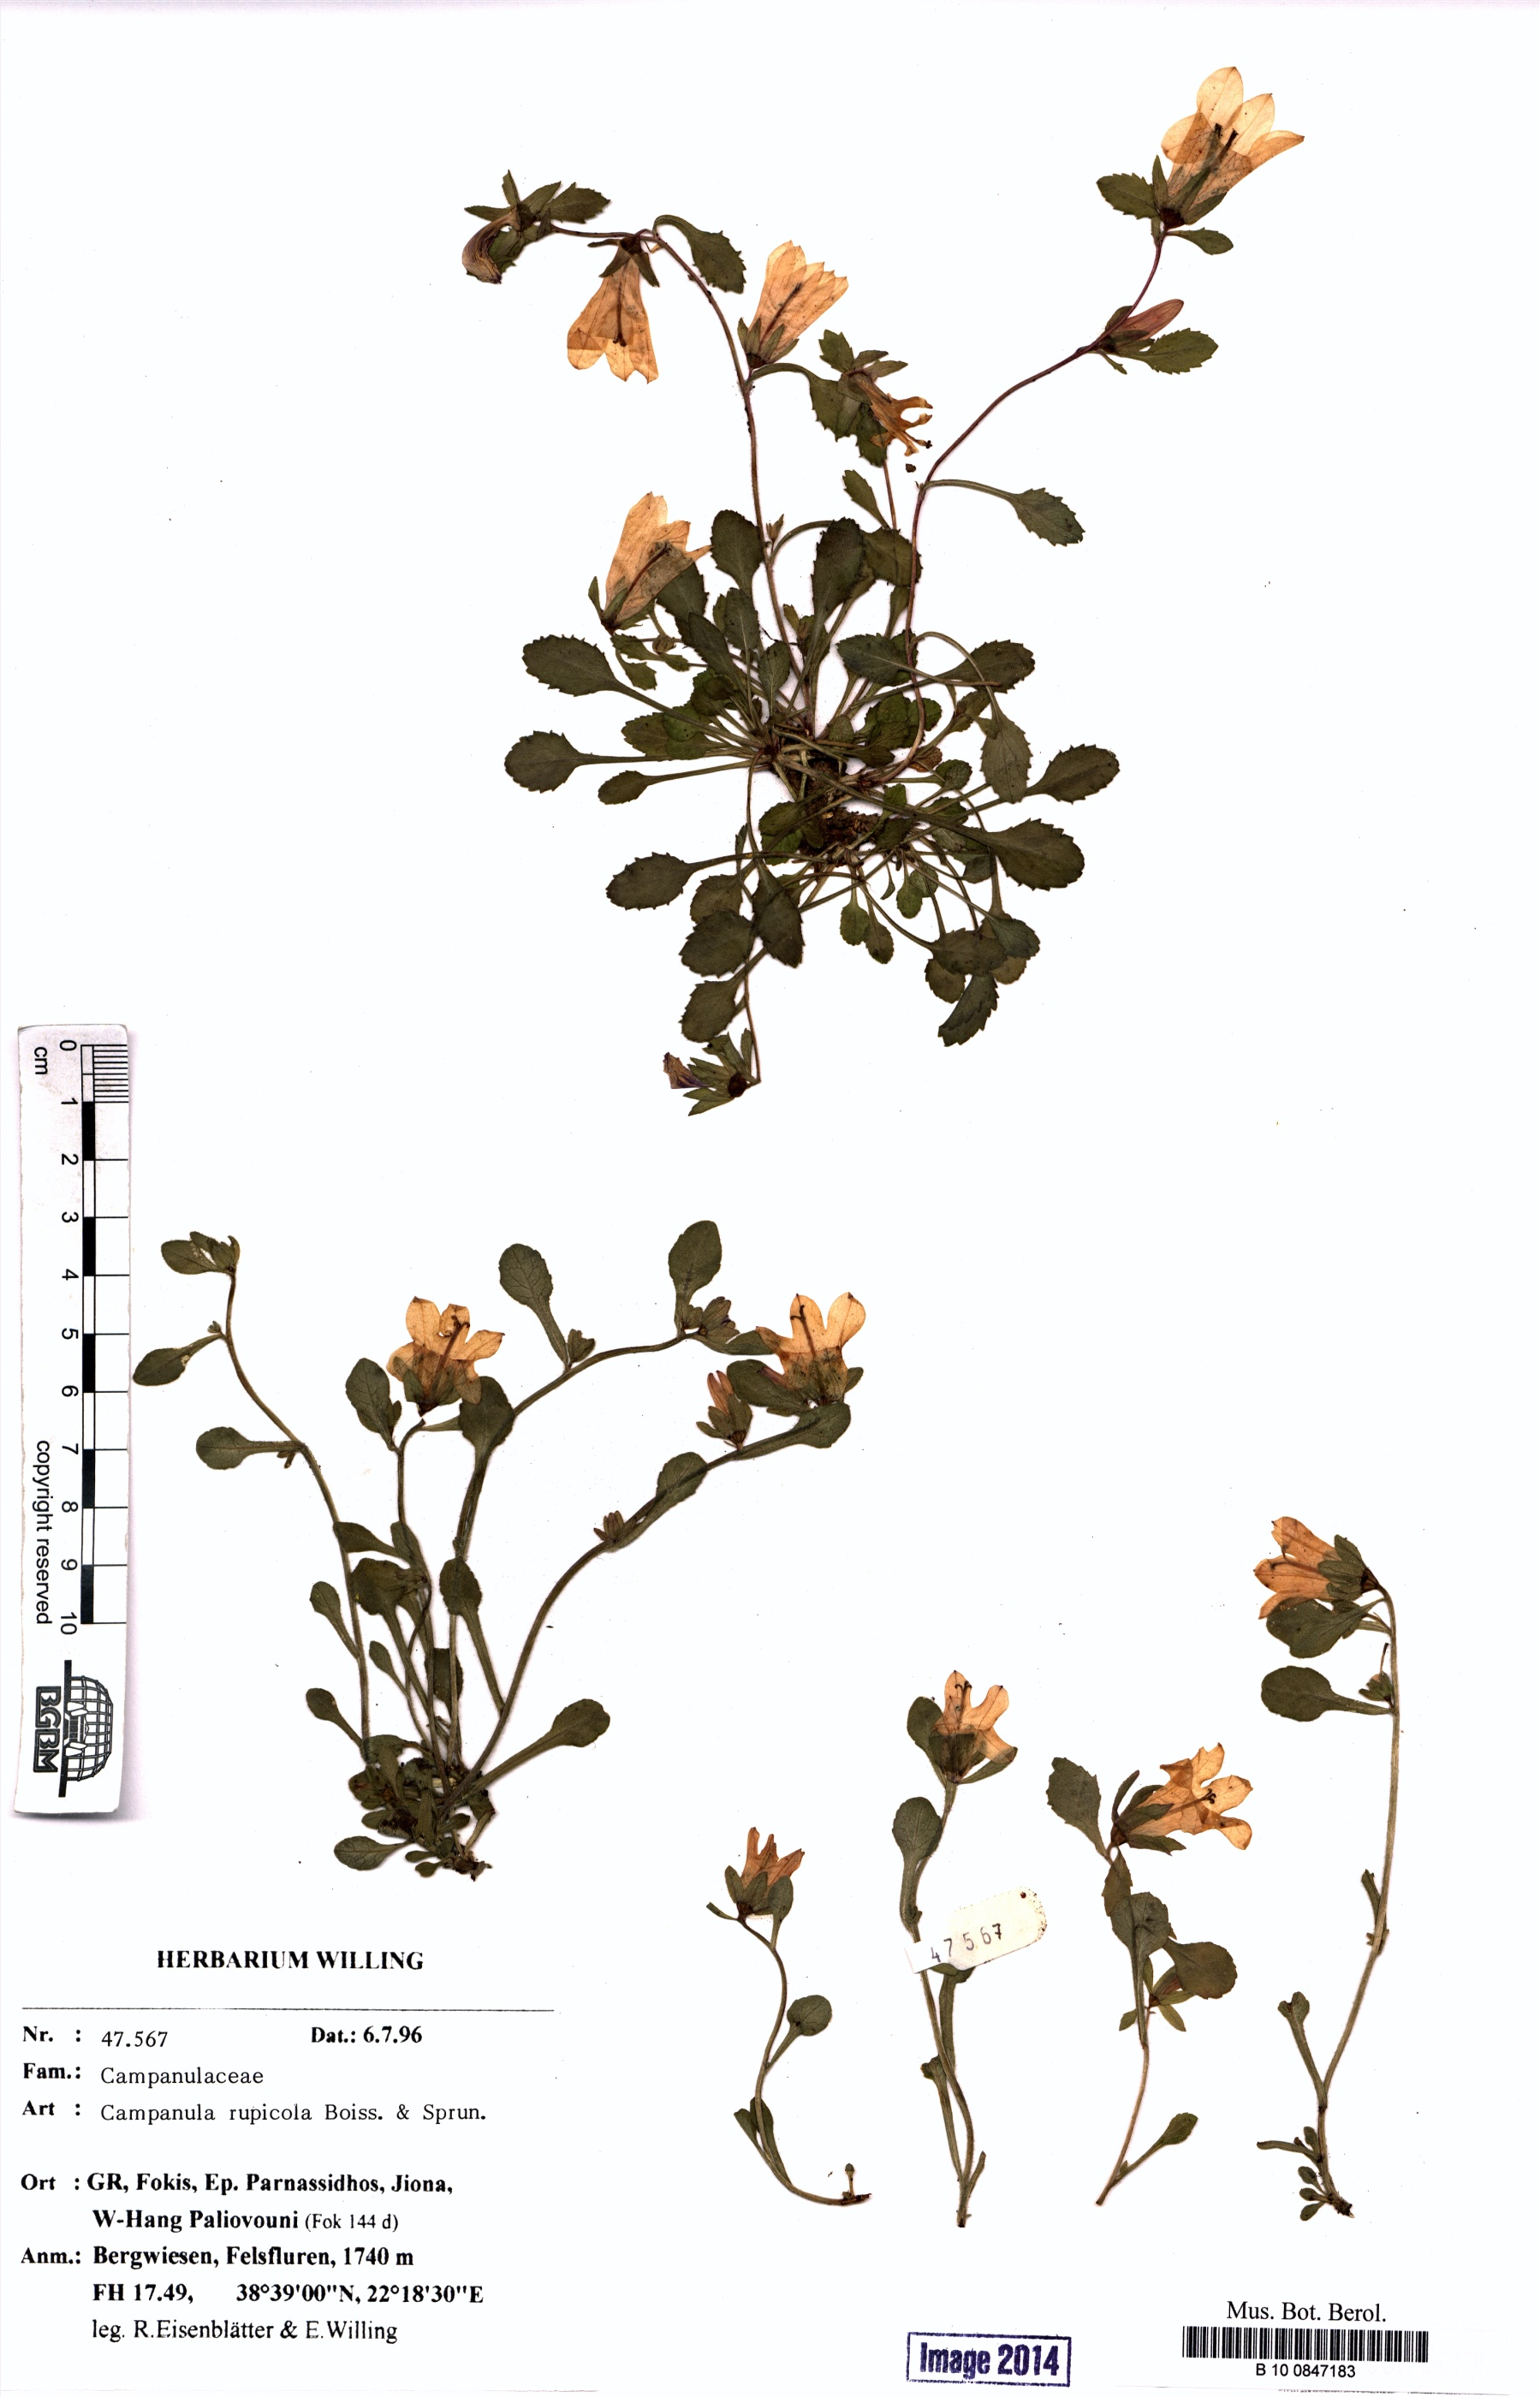 http://ww2.bgbm.org/herbarium/images/B/10/08/47/18/B_10_0847183.jpg